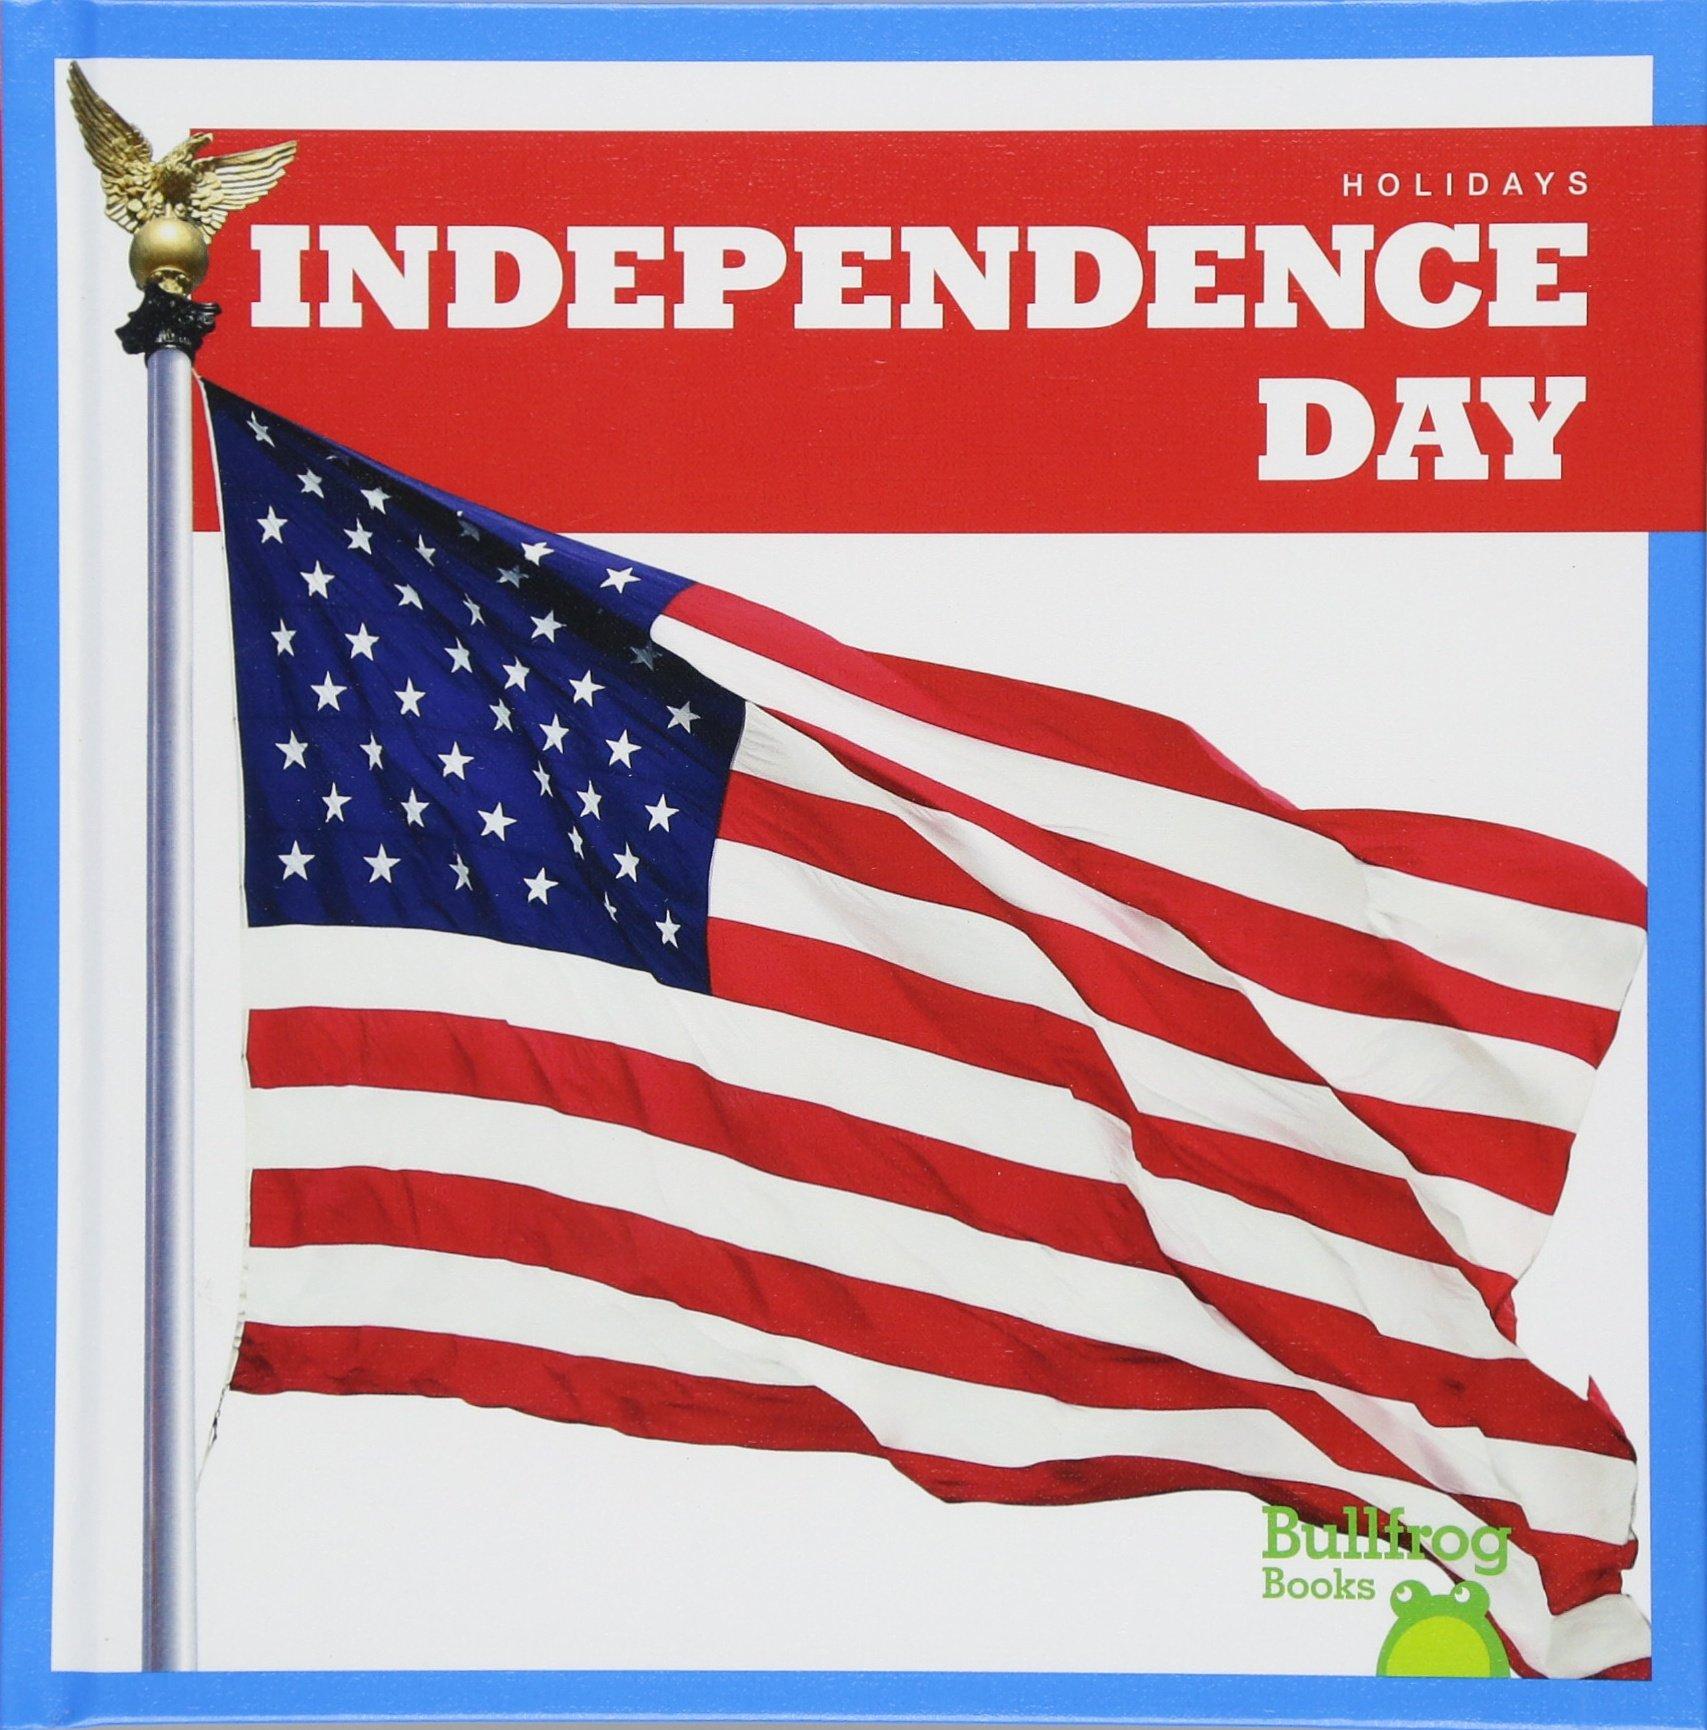 Independence Day (Bullfrog Books: Holidays)